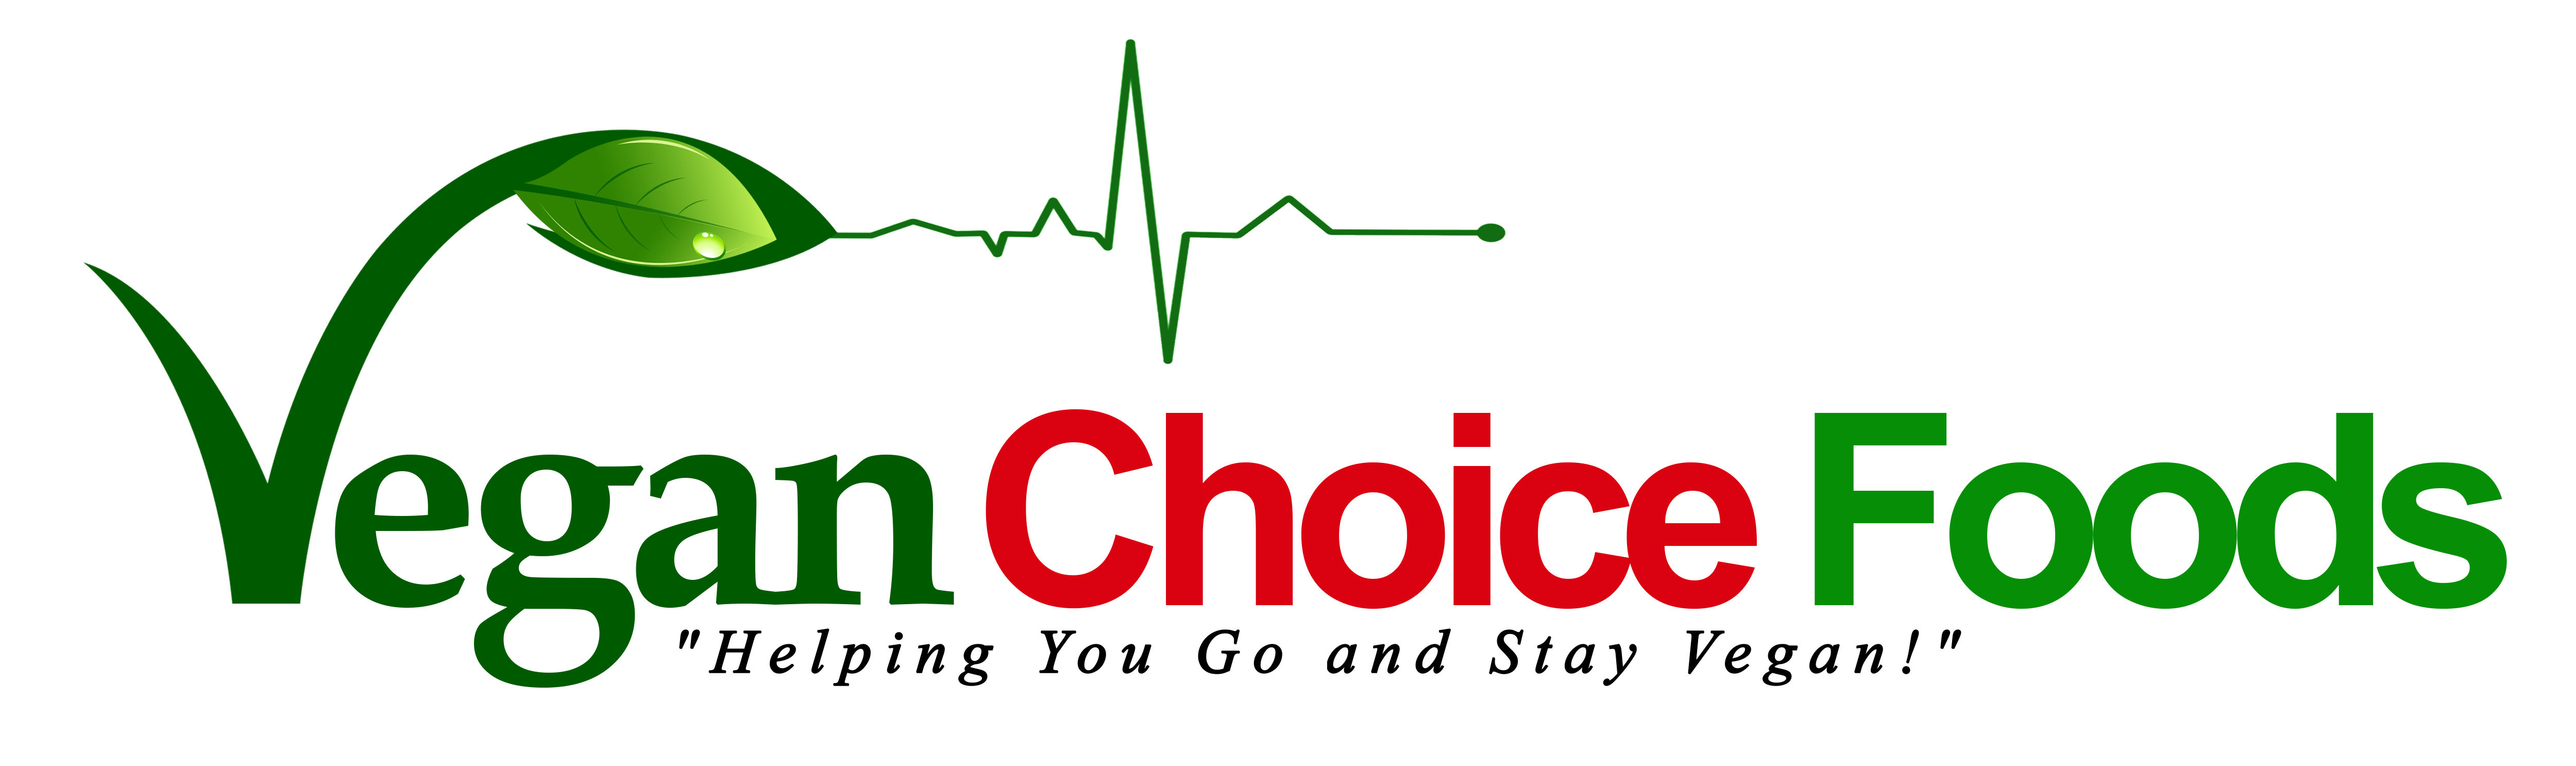 Vegan Choice Foods & Herbs